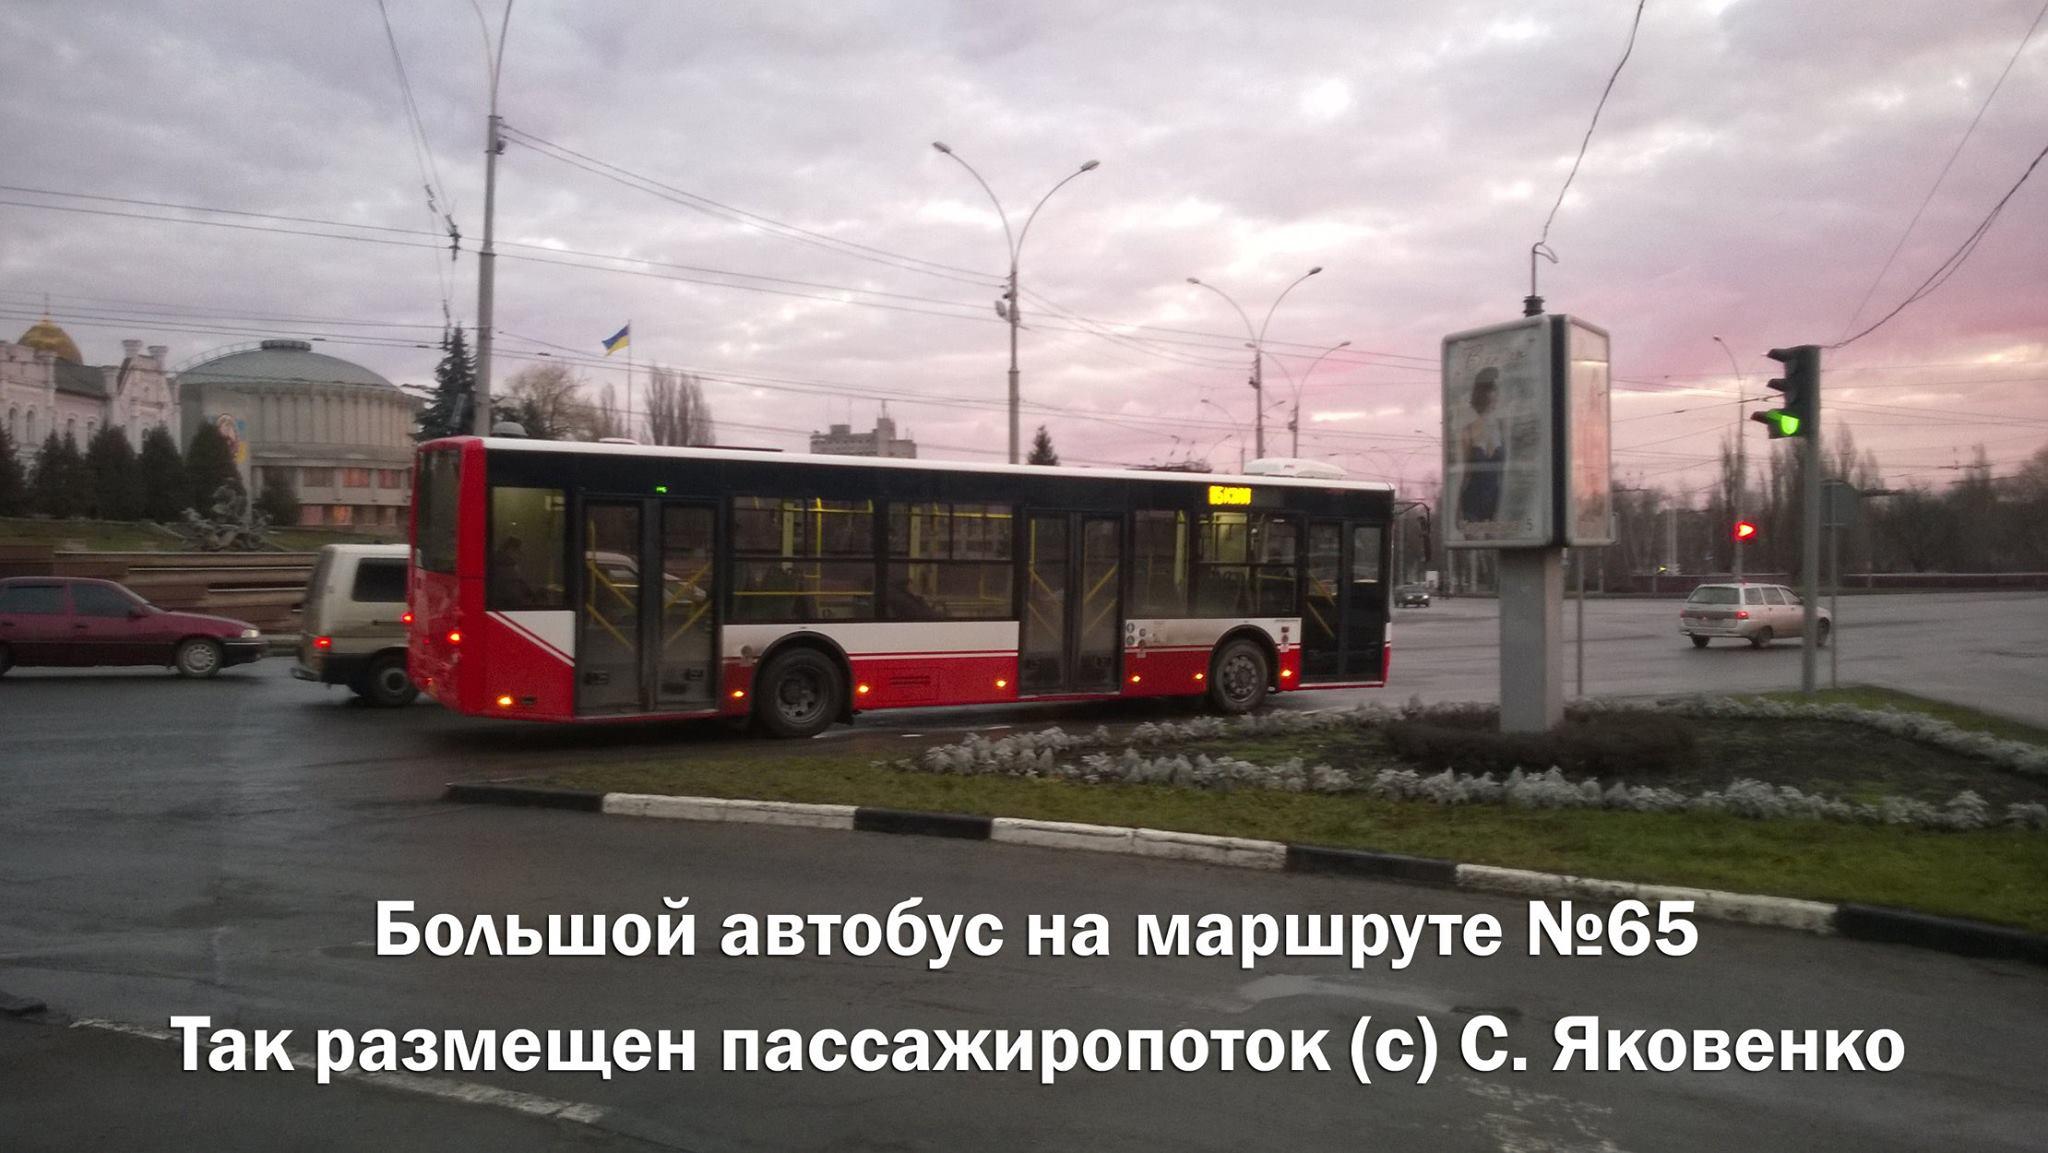 Автобус Богдан А701 на маршруте №65